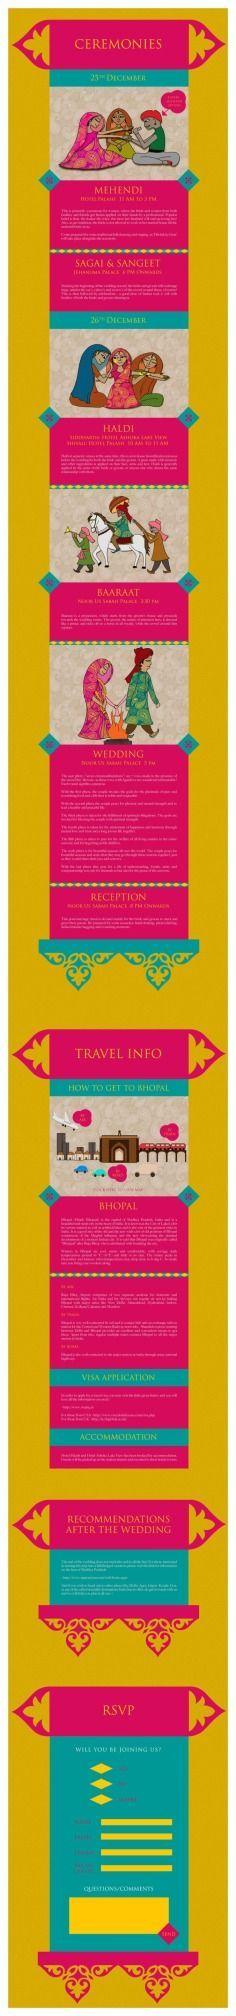 Kalayug Art and Design Studio Wedding Card Bride Groom Comic Invitation Guest Invite Yellow Pink Ceremony Celebration Reception Mehendi Sagai Sangeet Baraat Haldi Phera Wedding